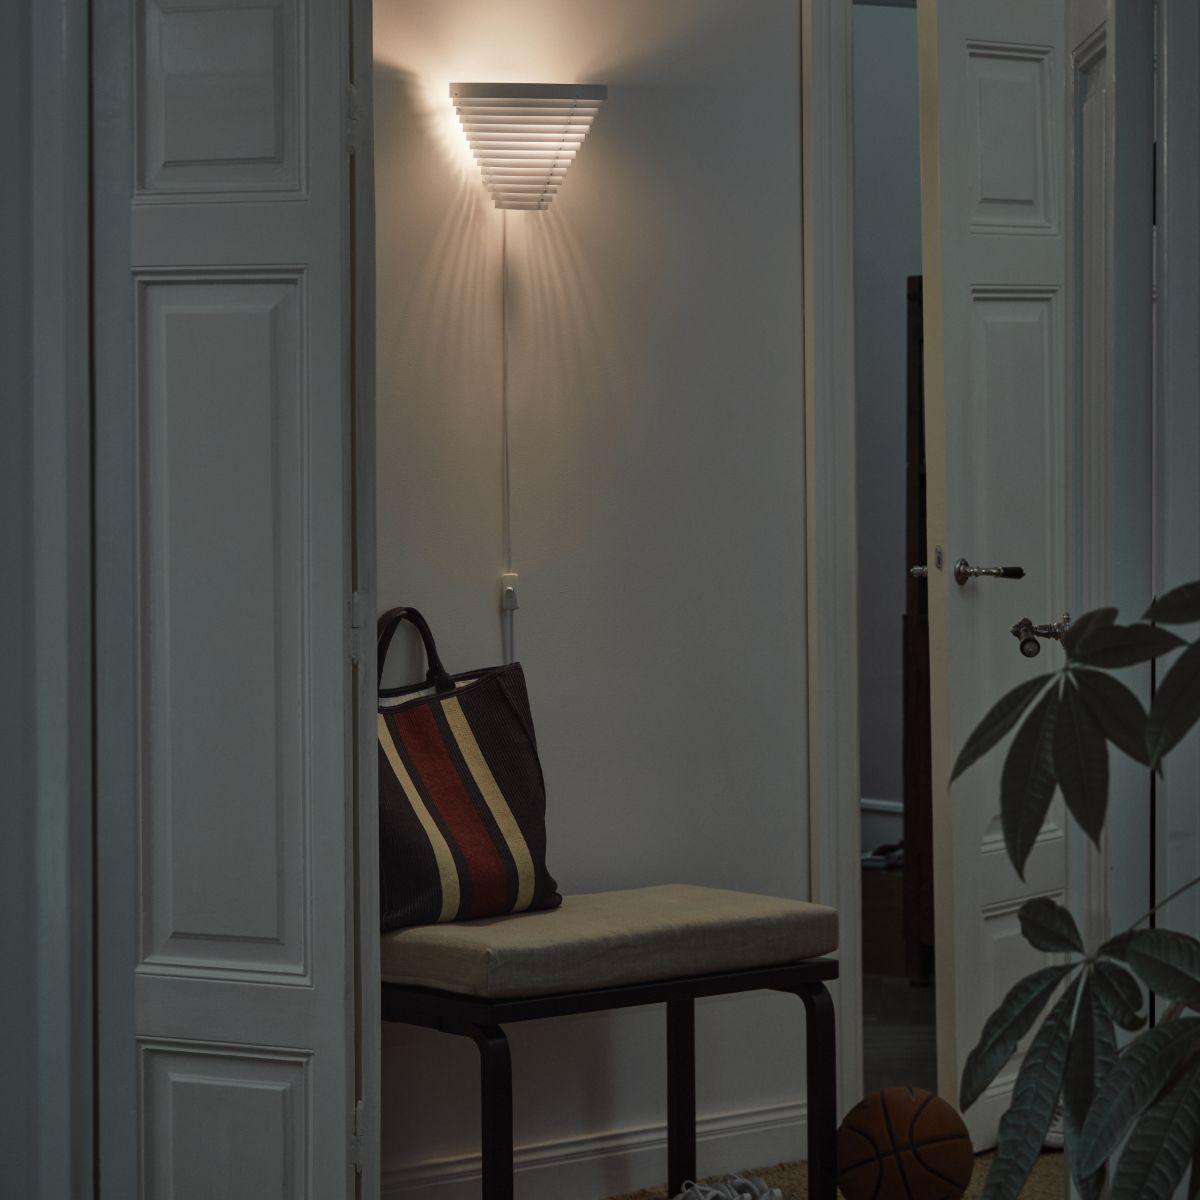 Wall_light_A910_On